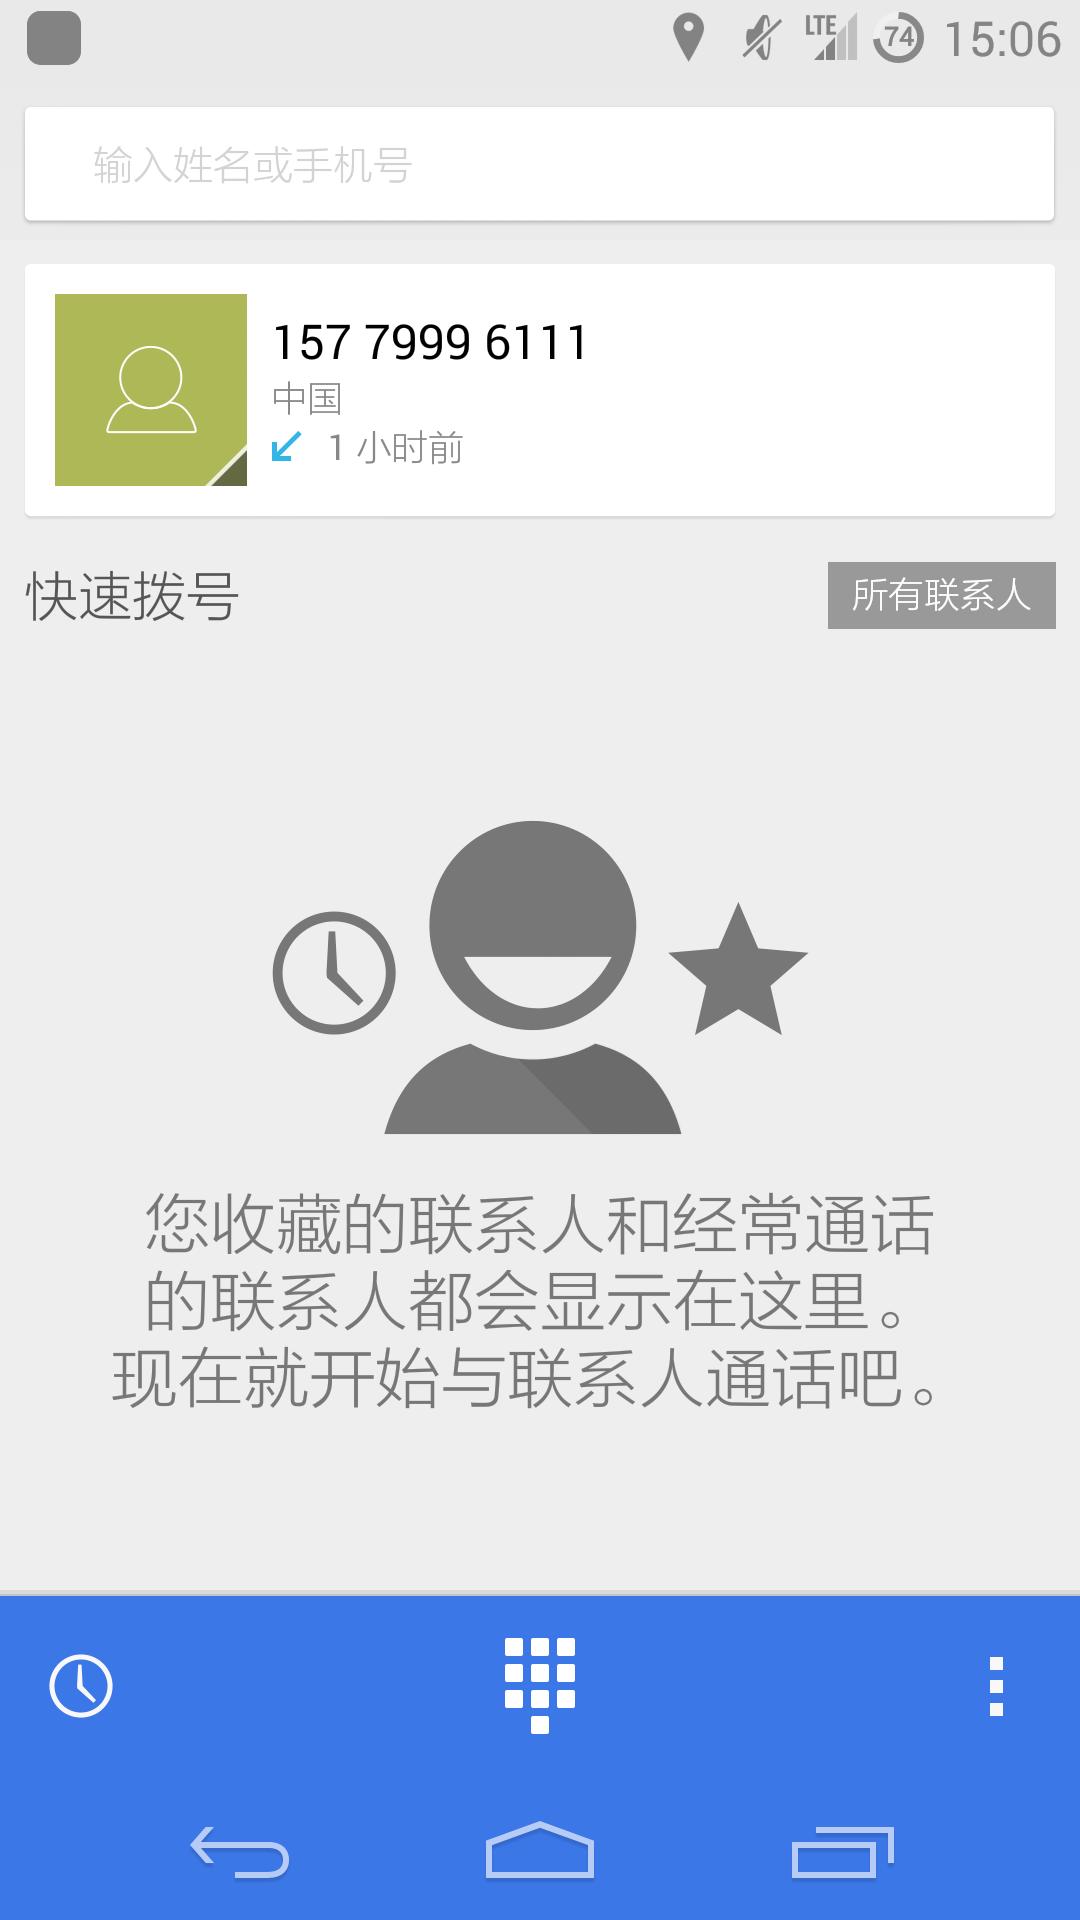 Screenshot_2013-09-17-15-06-10.png